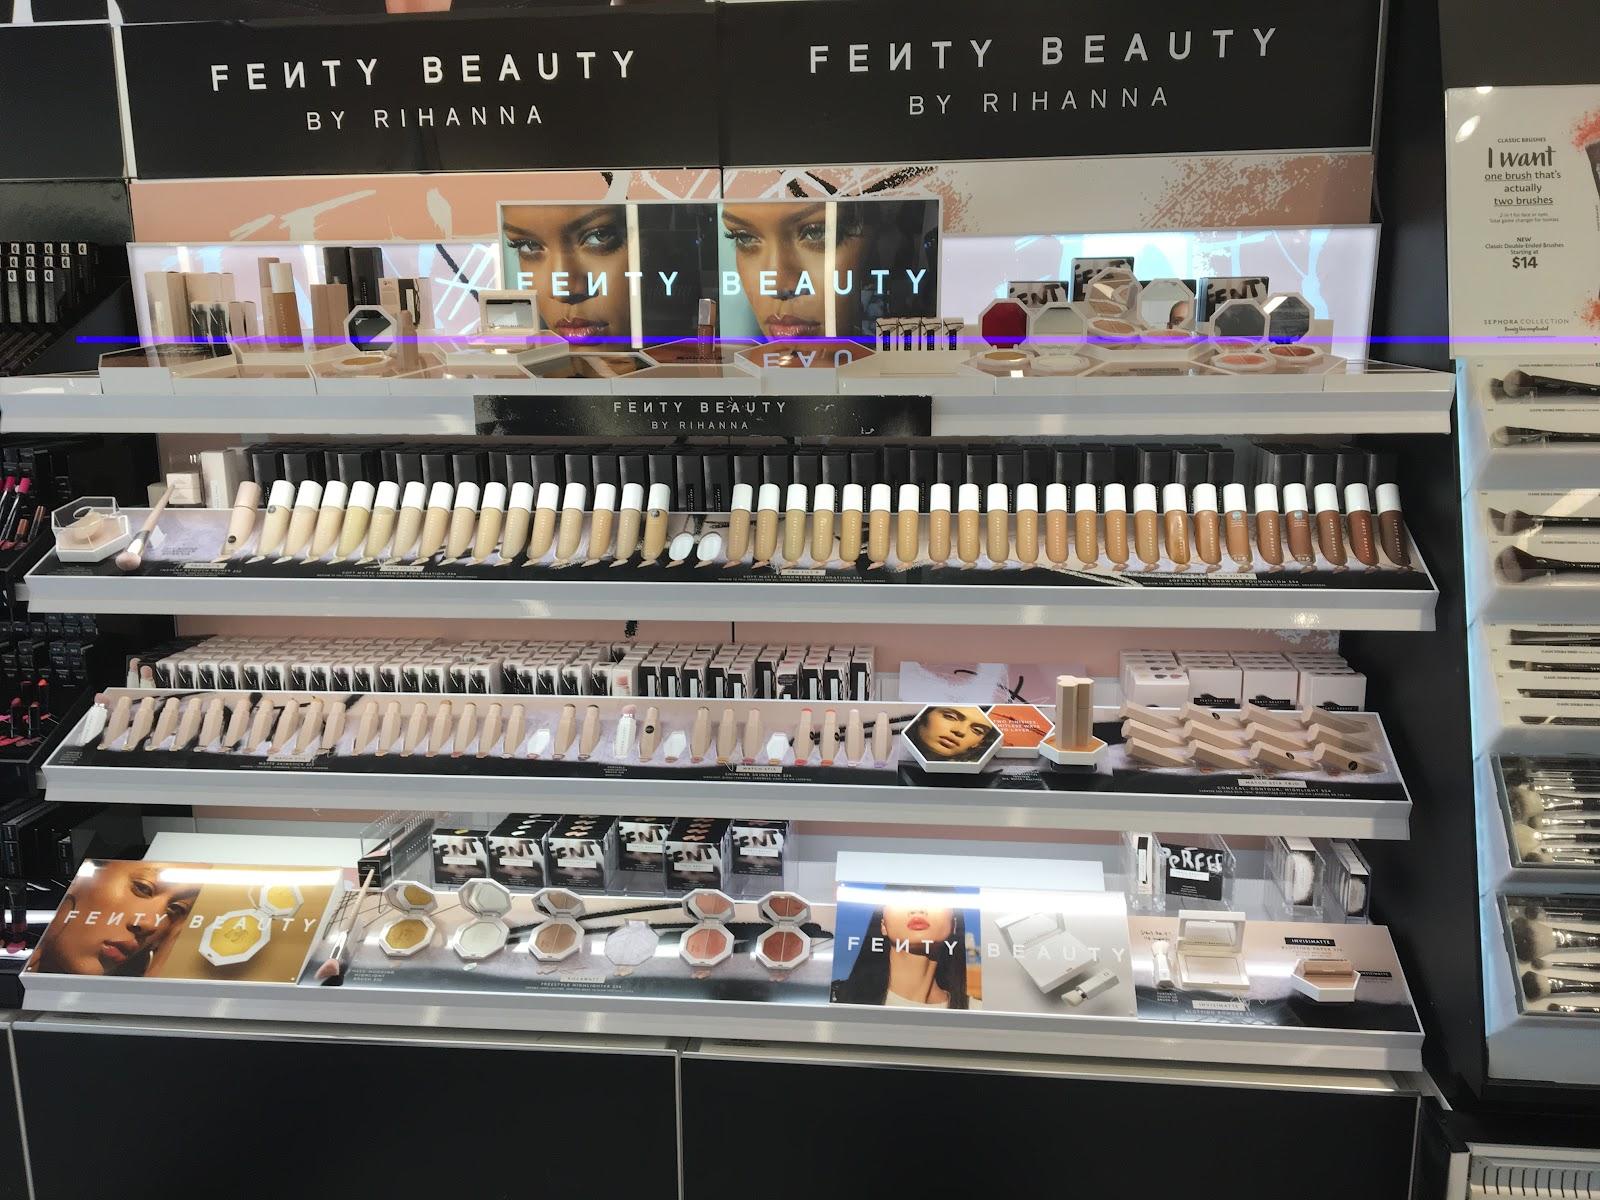 Rihanna S New Fenty Beauty Makeup Line Her Campus